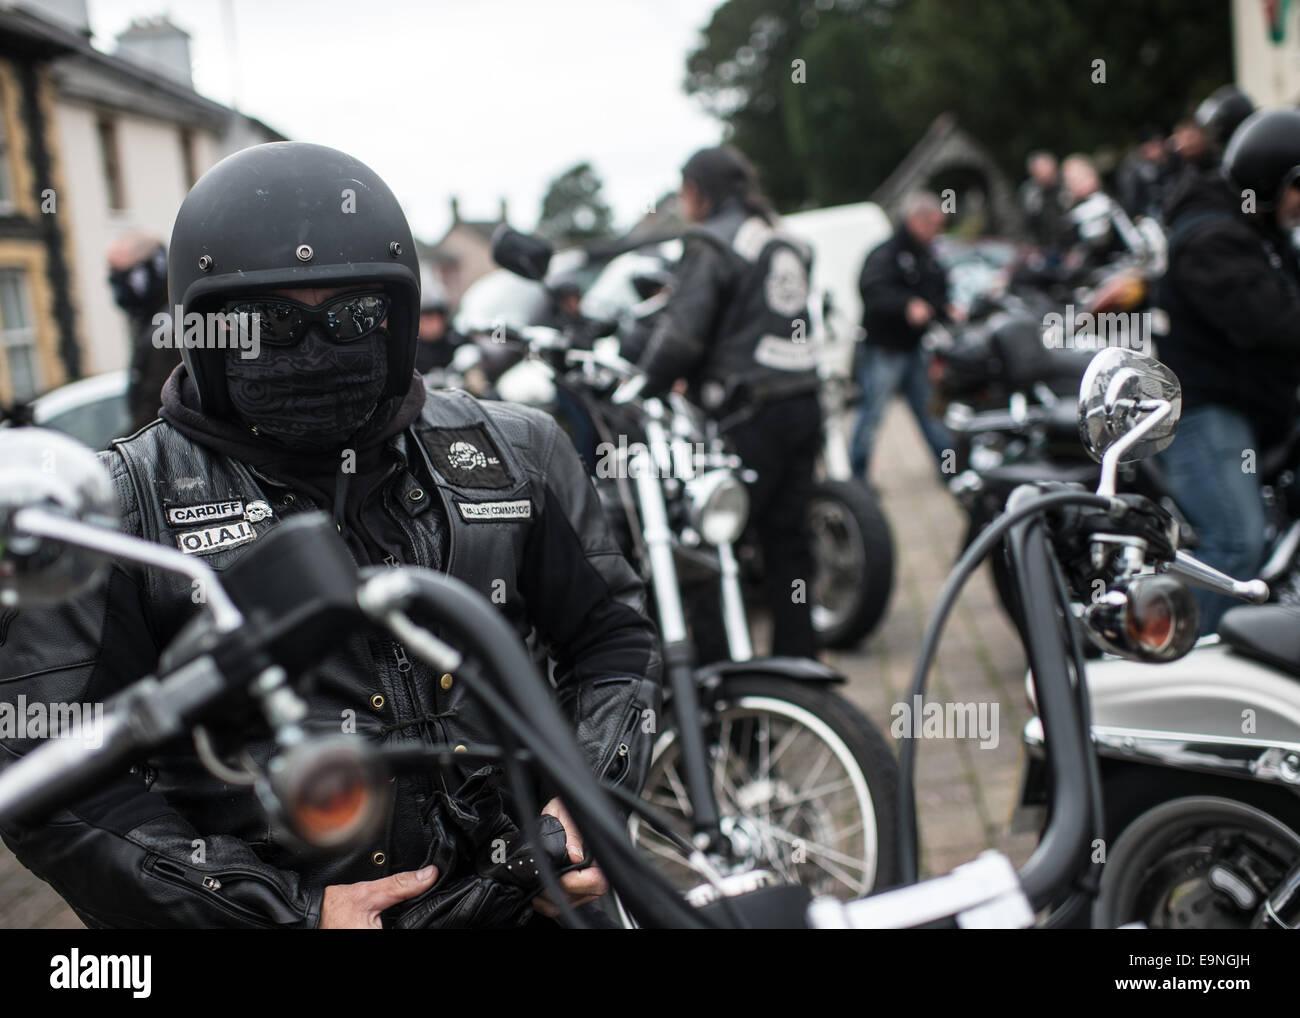 Motor Bikers Uk Stock Photos & Motor Bikers Uk Stock Images - Alamy